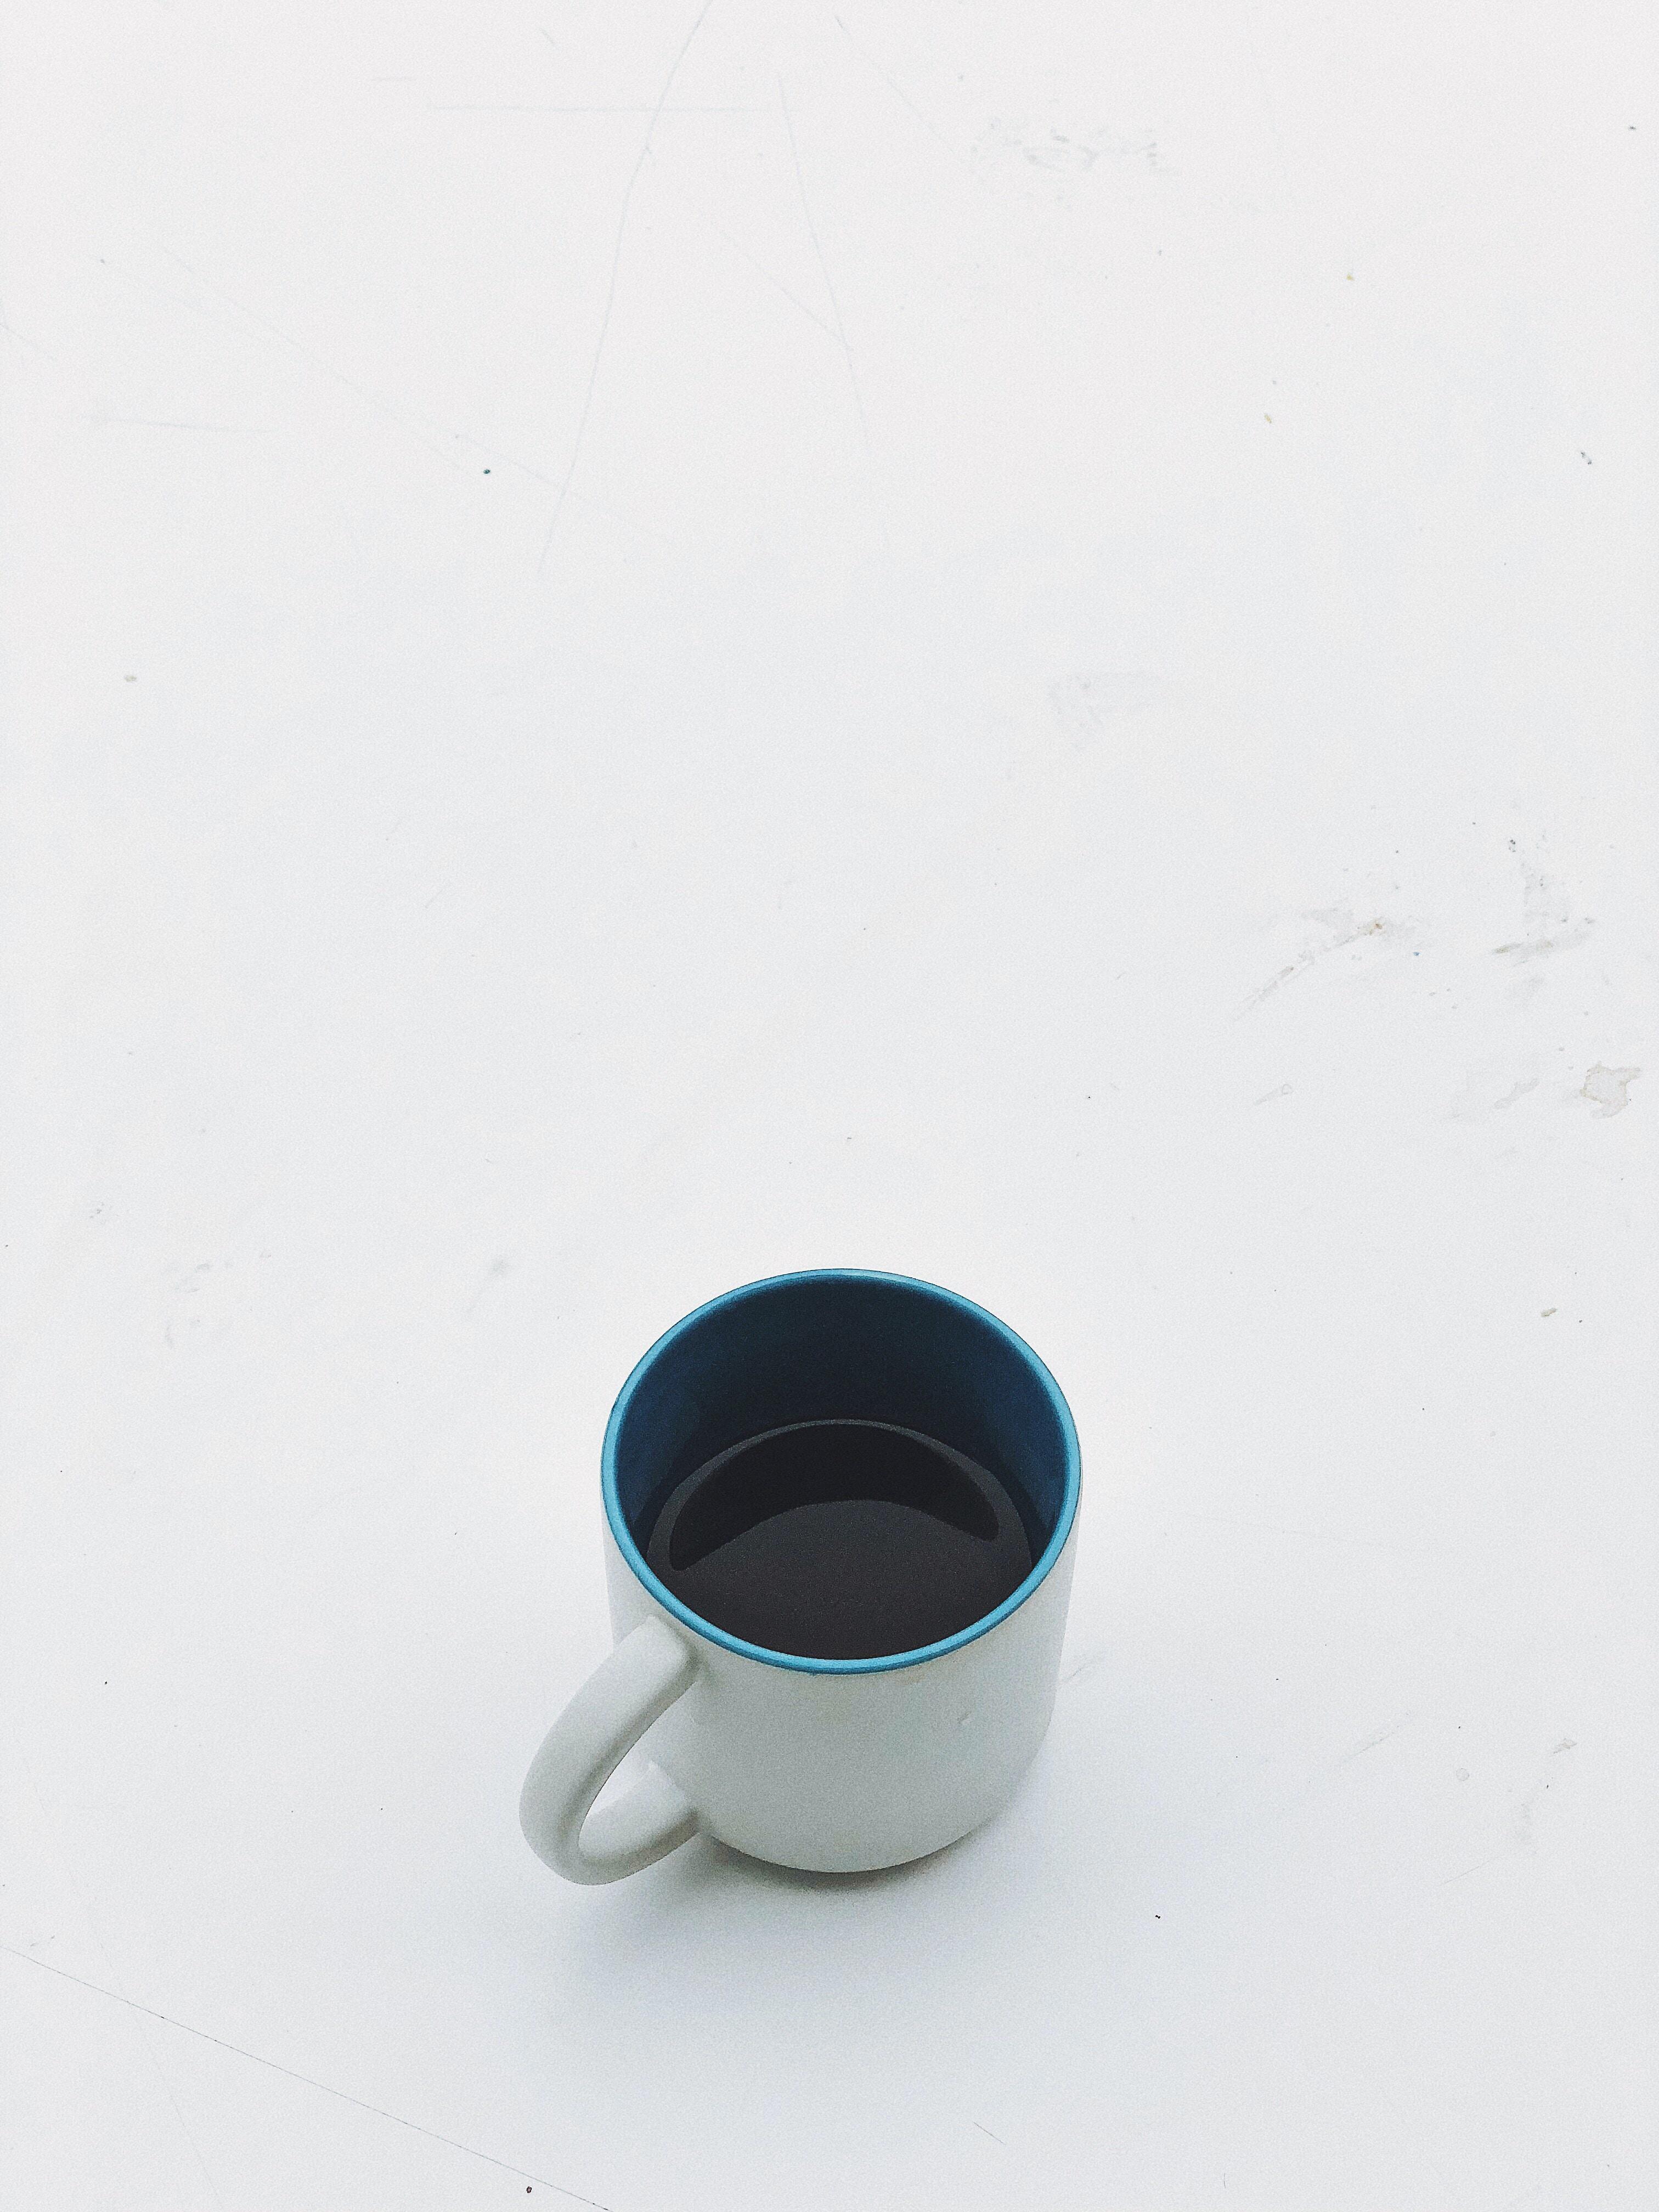 half filled black coffee